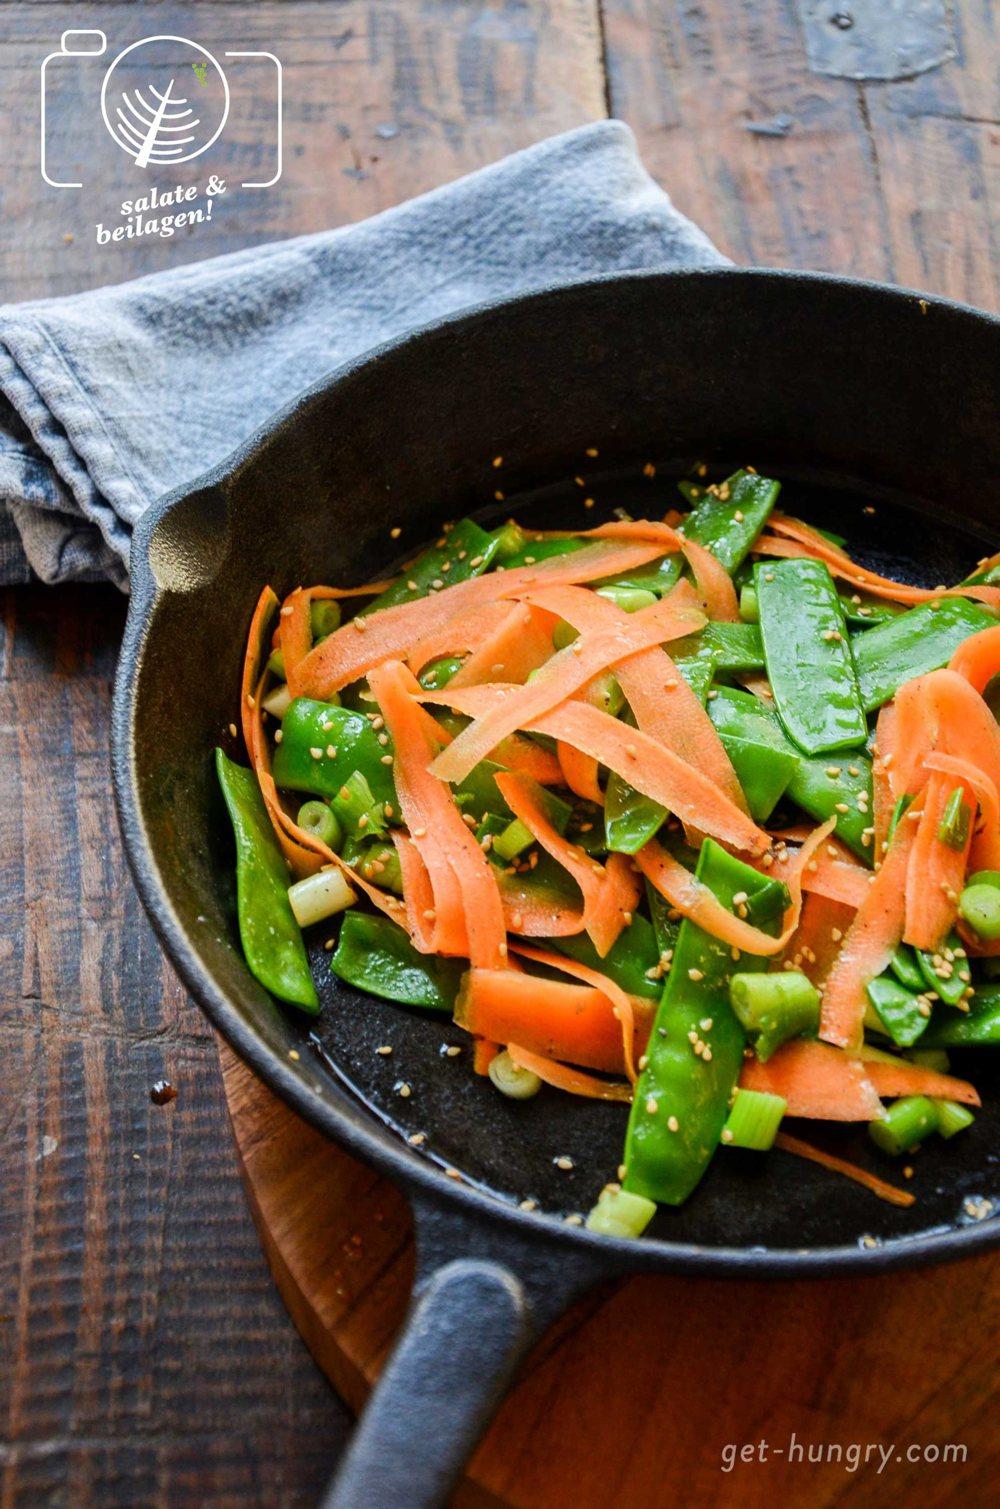 Karotten-Zuckerschoten-Sesam-Gemüse